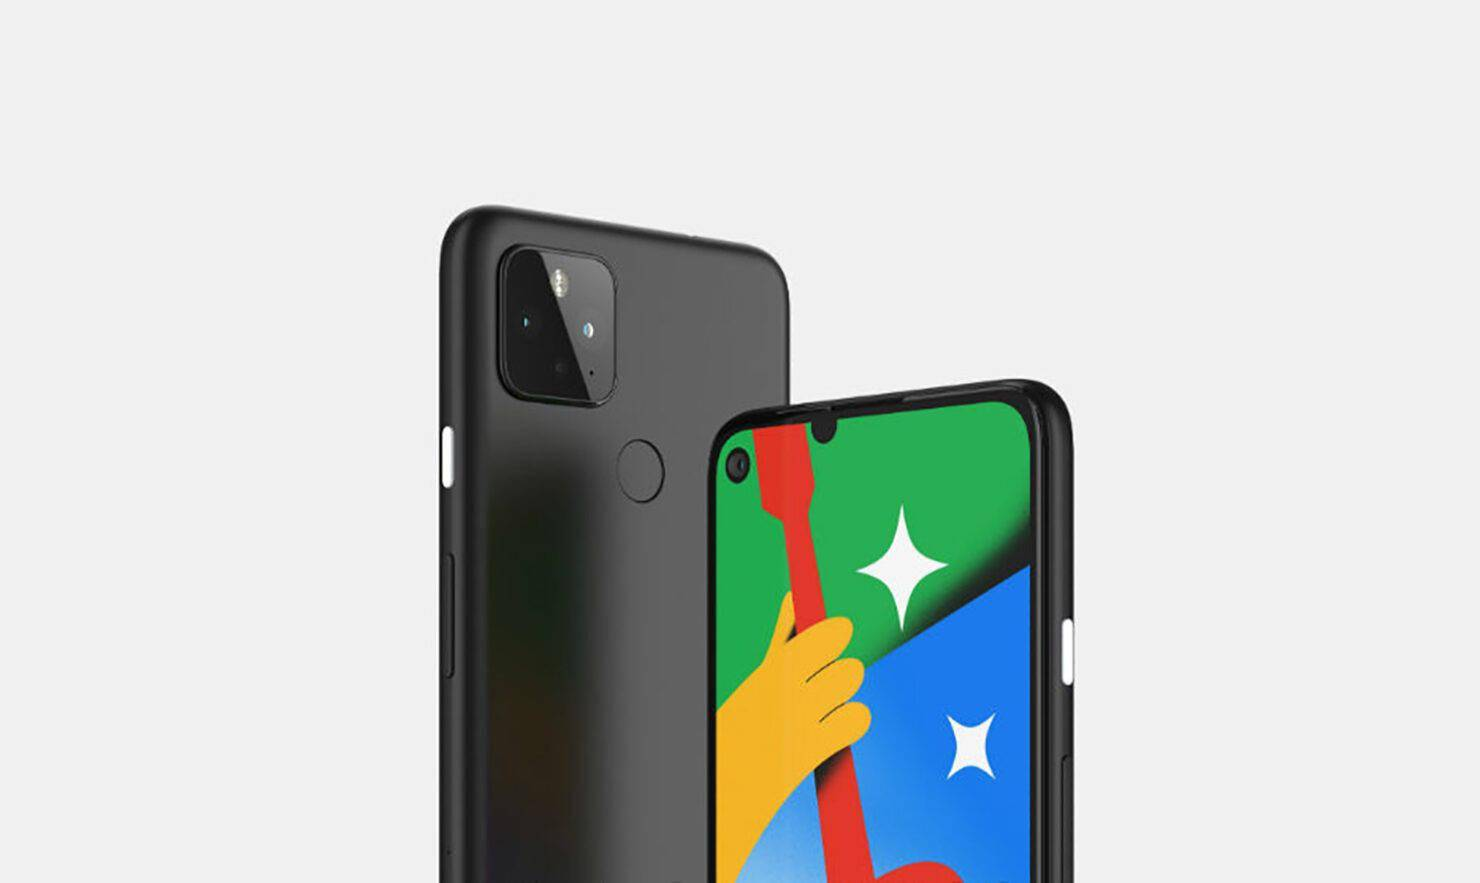 Google Pixel 4a 5G完整规格曝光:大部分与Pixel 5相同